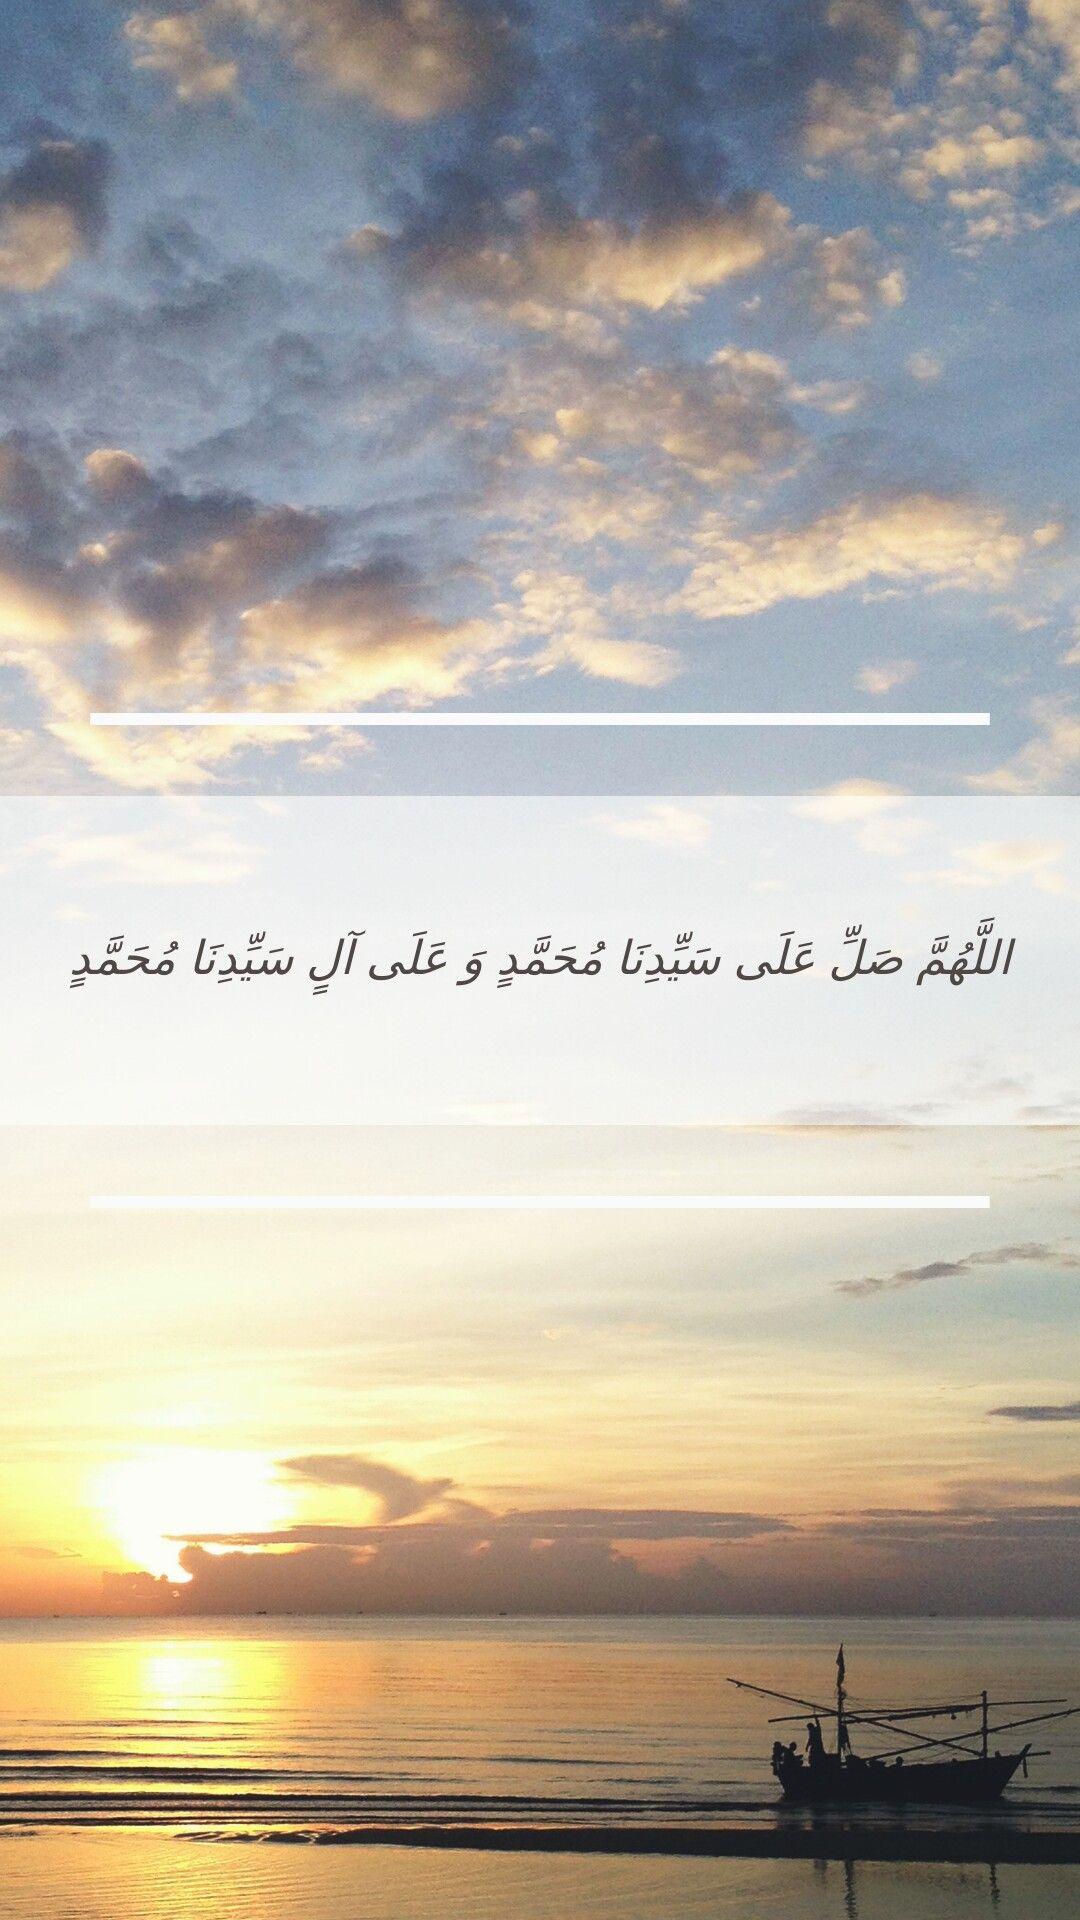 Allahumma Sholli Ala Sayyidina Muhammad Wa Ala Ali Sayyidina Muhammad Artinya : allahumma, sholli, sayyidina, muhammad, artinya, Islam